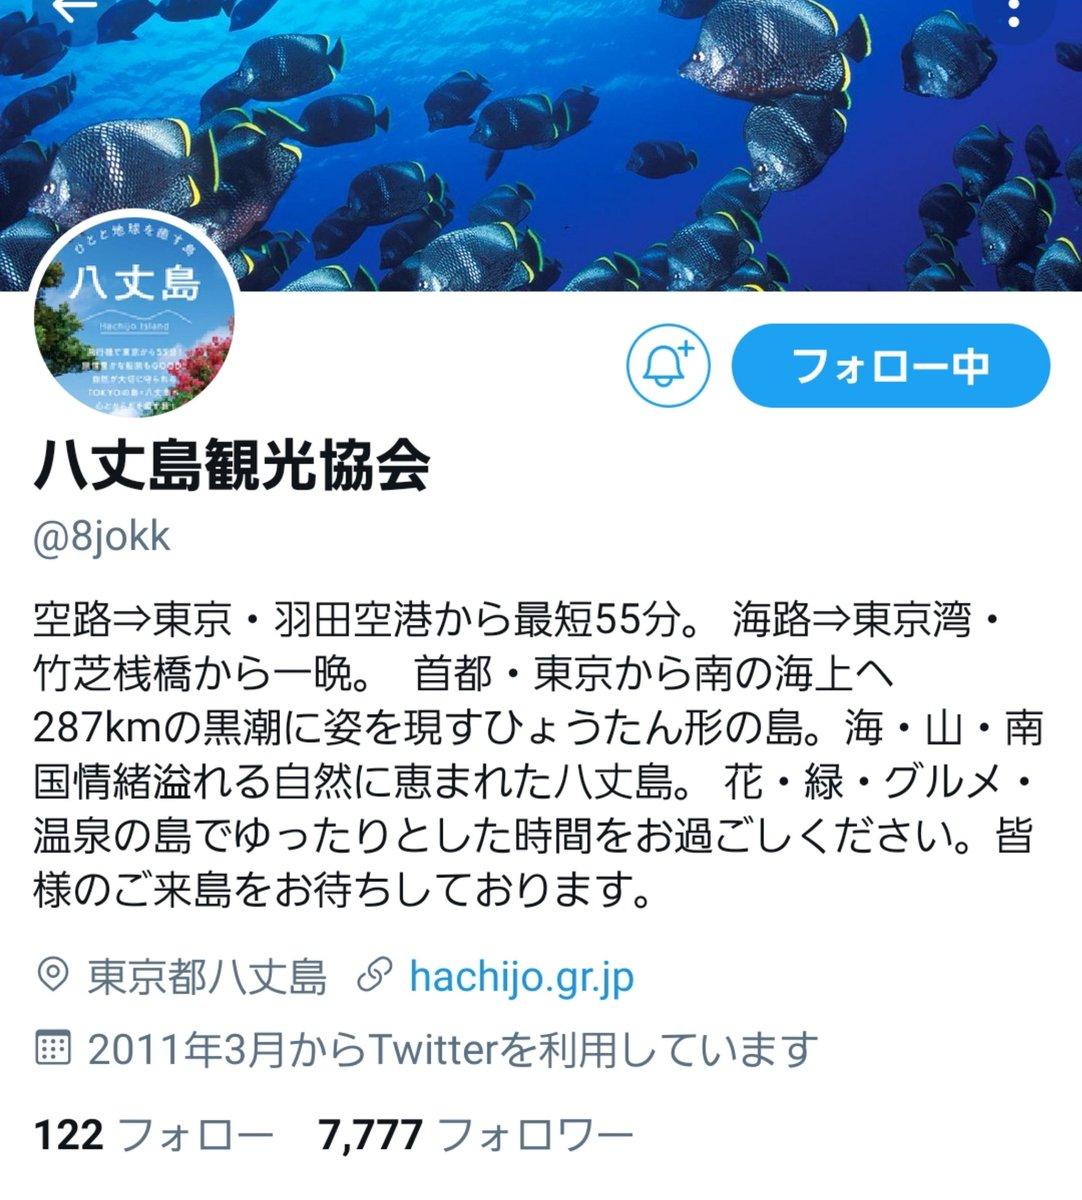 test ツイッターメディア - 東京都八丈町のTwitterはフォローしていたけれど、観光協会さんのTwitterも発見して(プロフィール可愛い!)フォローしたら7777人目だった! やった~!  #八丈島 #伊豆諸島 https://t.co/kueUua8AIM